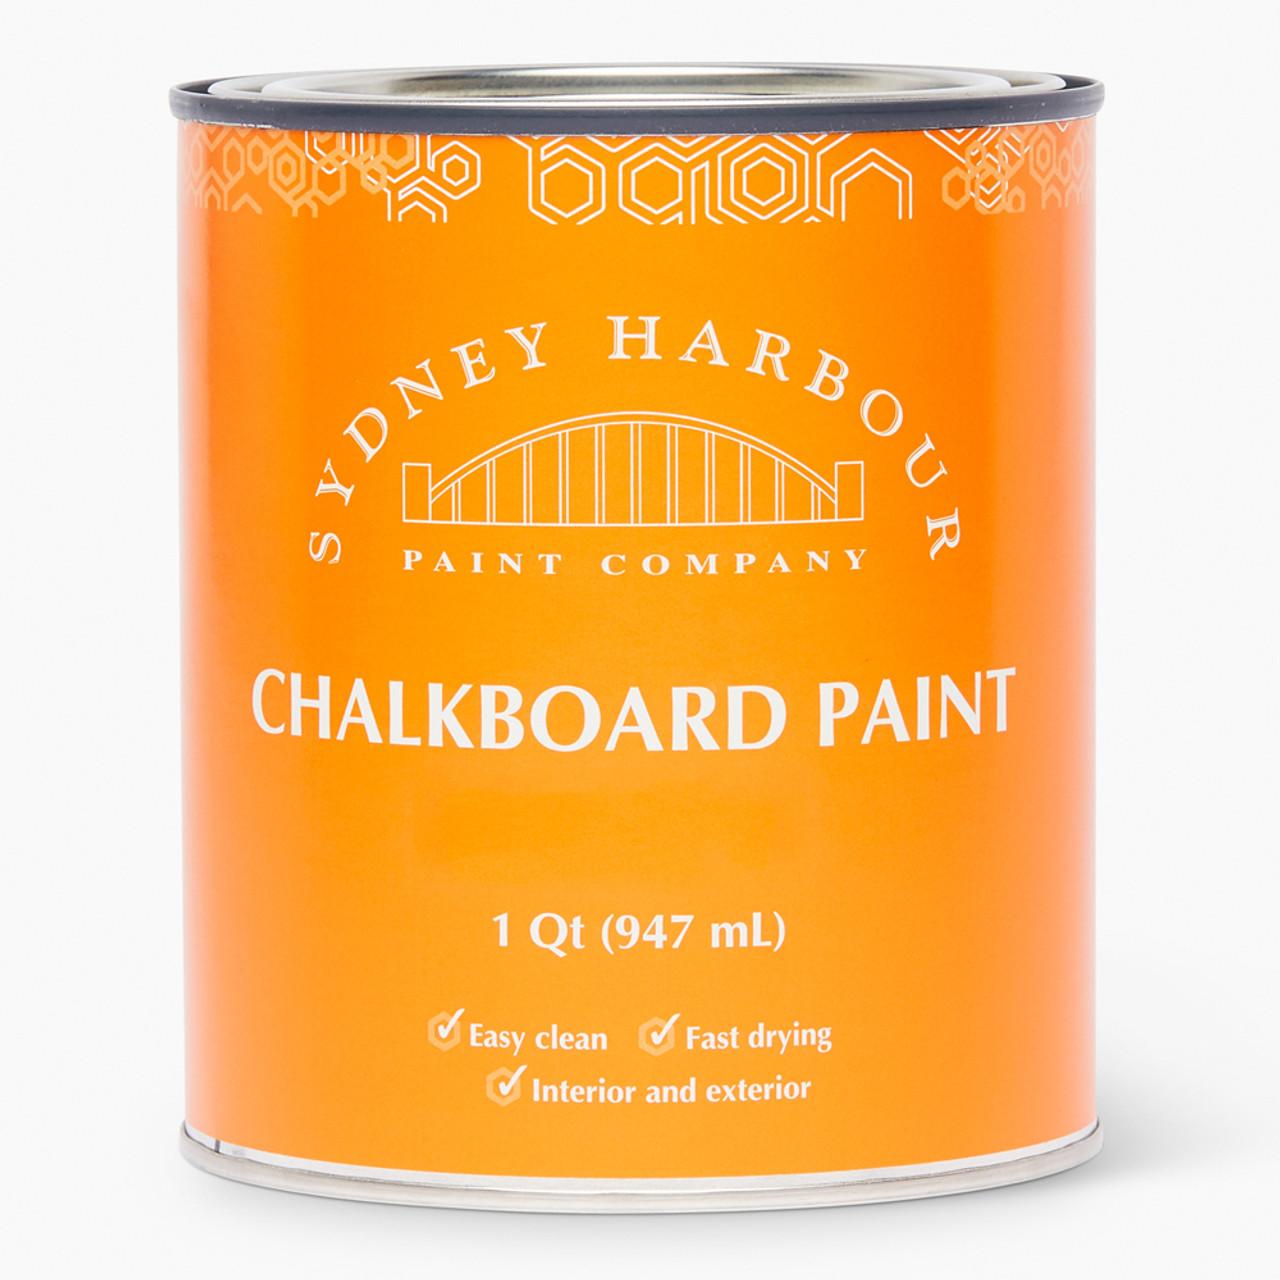 Sydney Harbour Interior/Exterior Chalkboard Paint